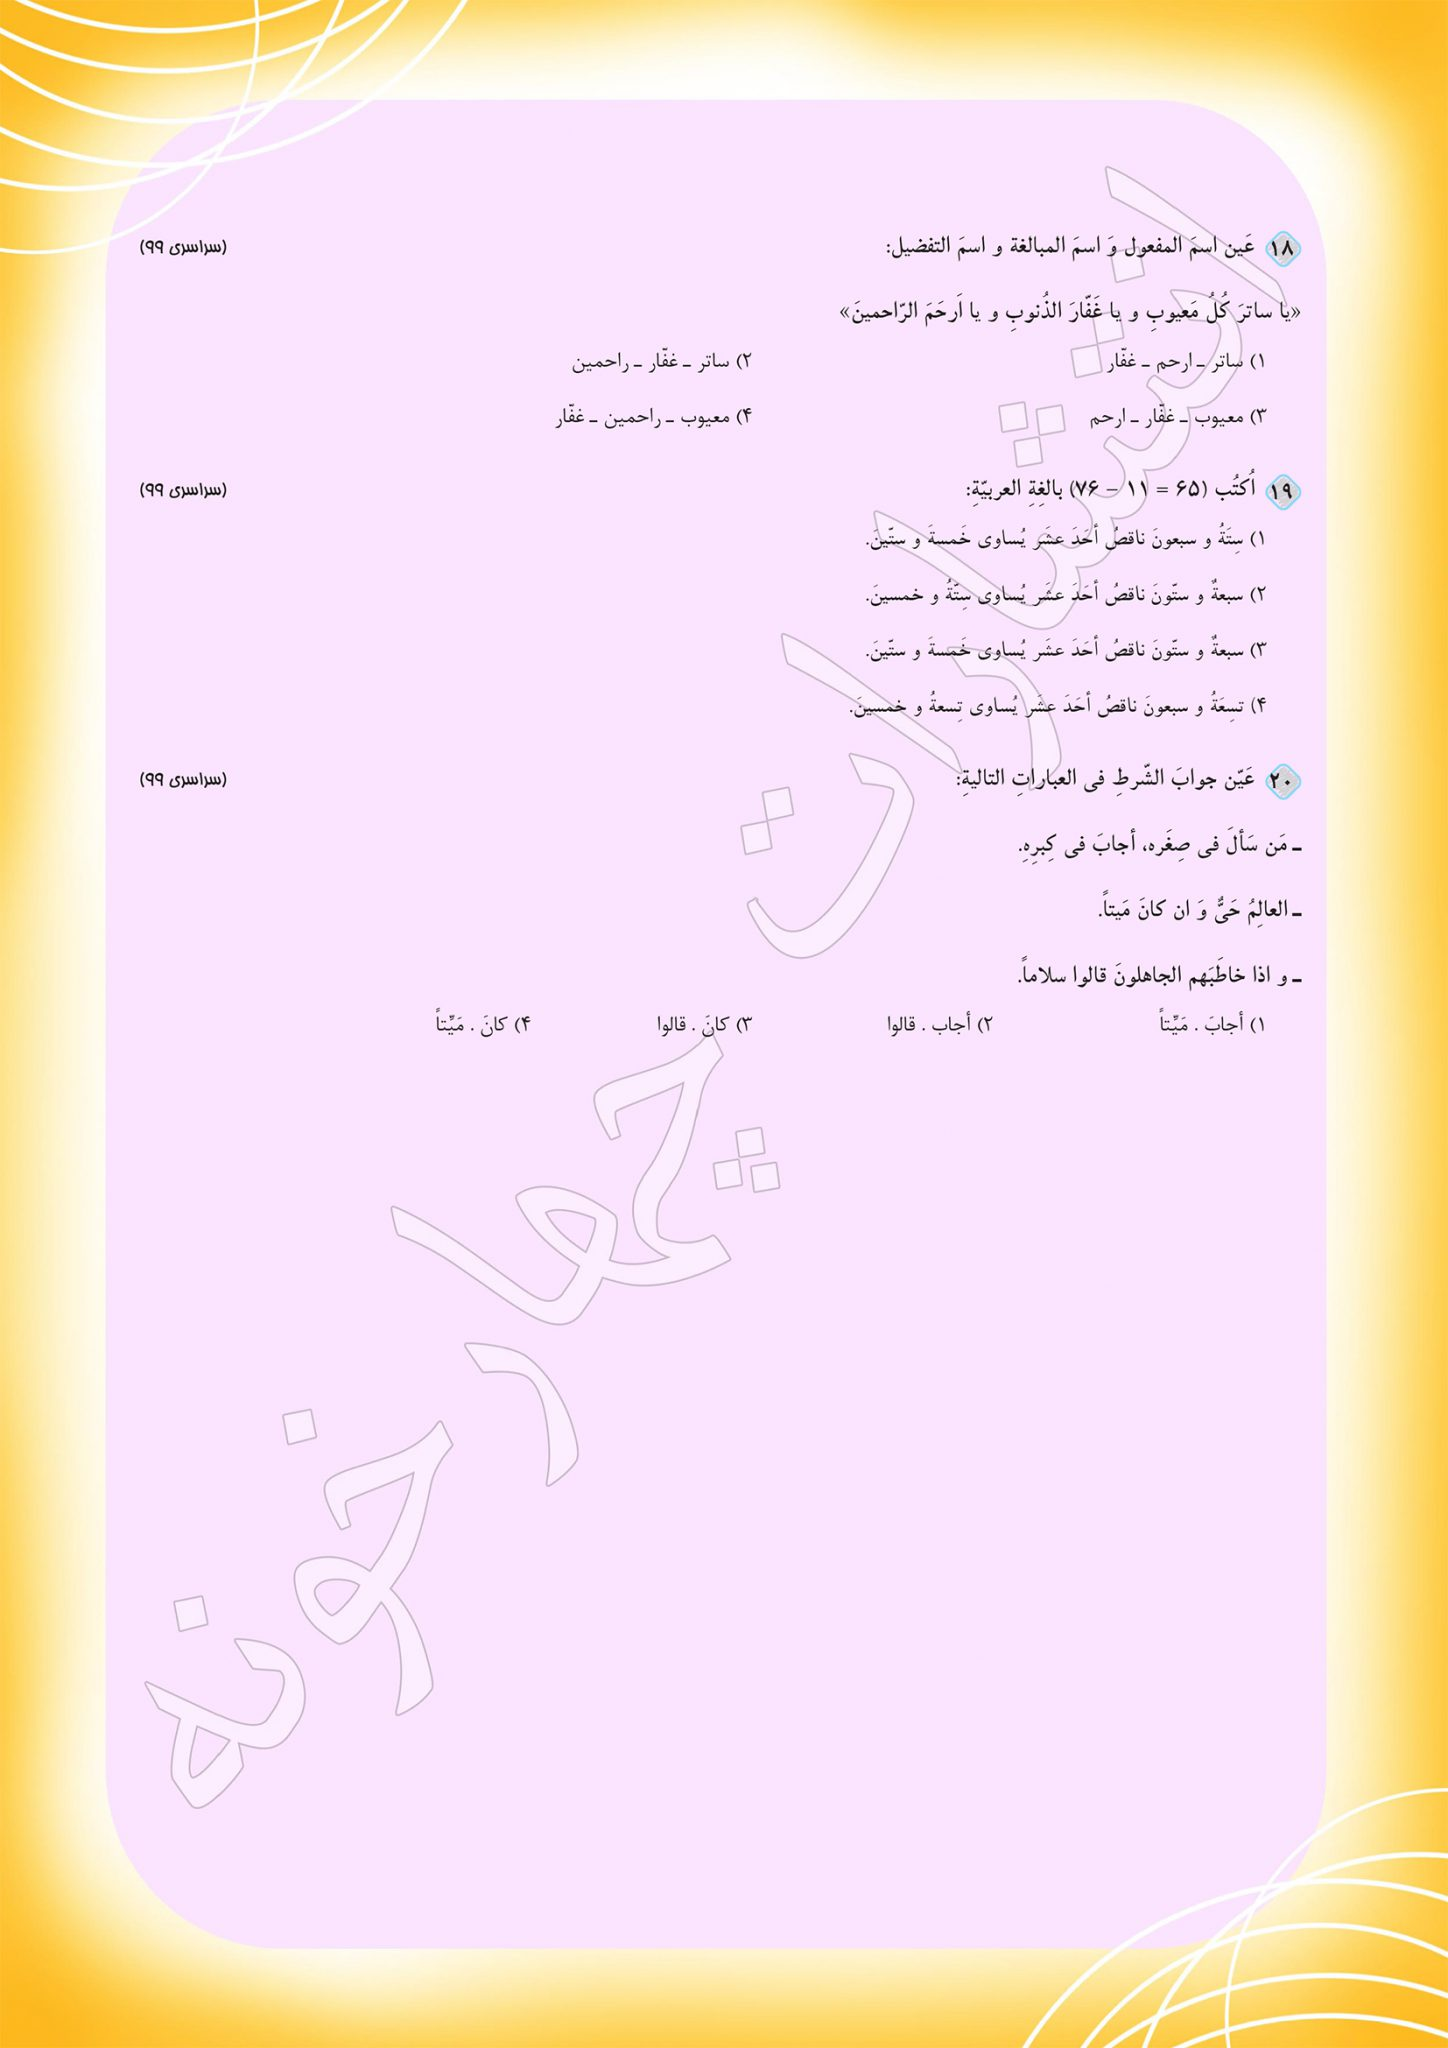 کنکور عربی 3